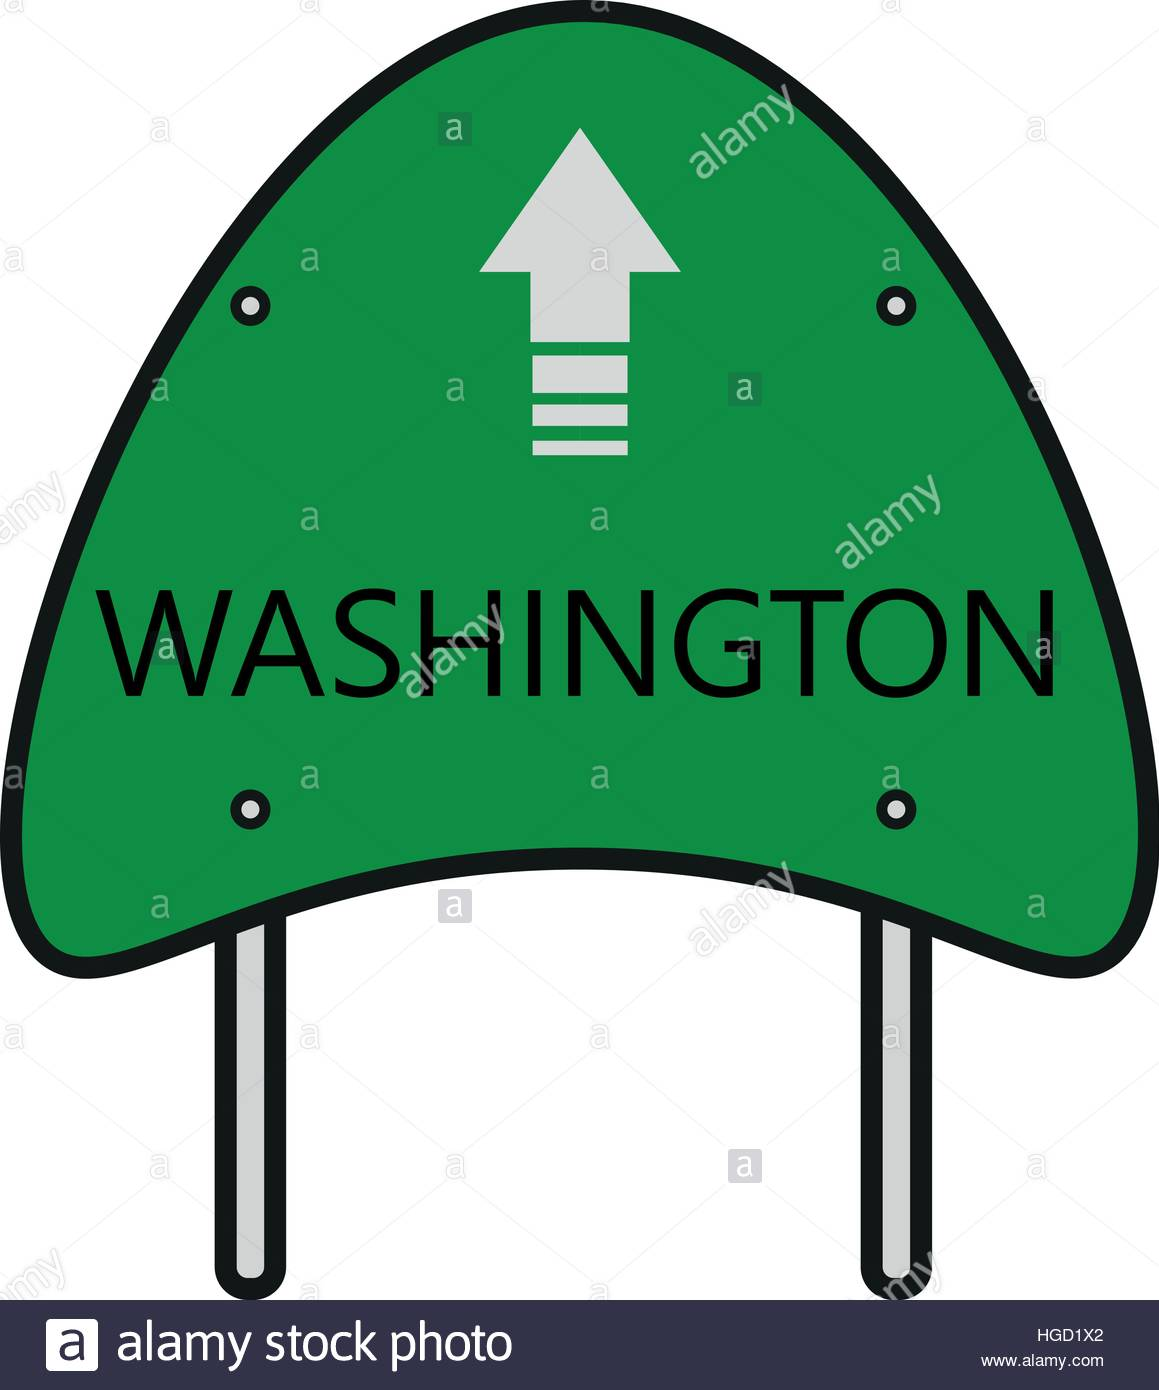 Washington State - Stock Vector